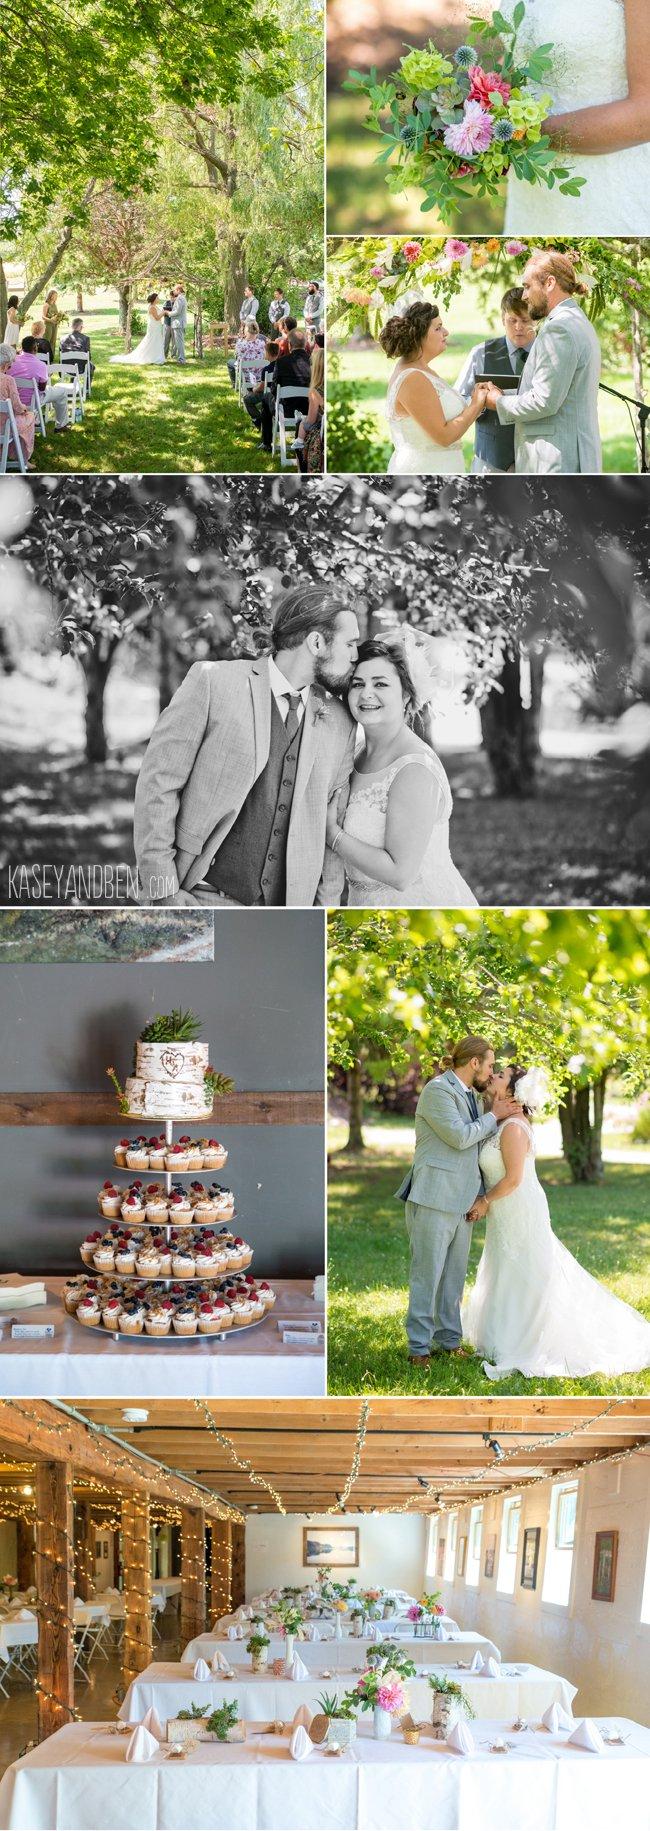 kewaunee-barnsite-wedding-photography-green-bay-photographer-rustic-summer-barn-outside-wisconsin-lake-michigan-waterfront-3